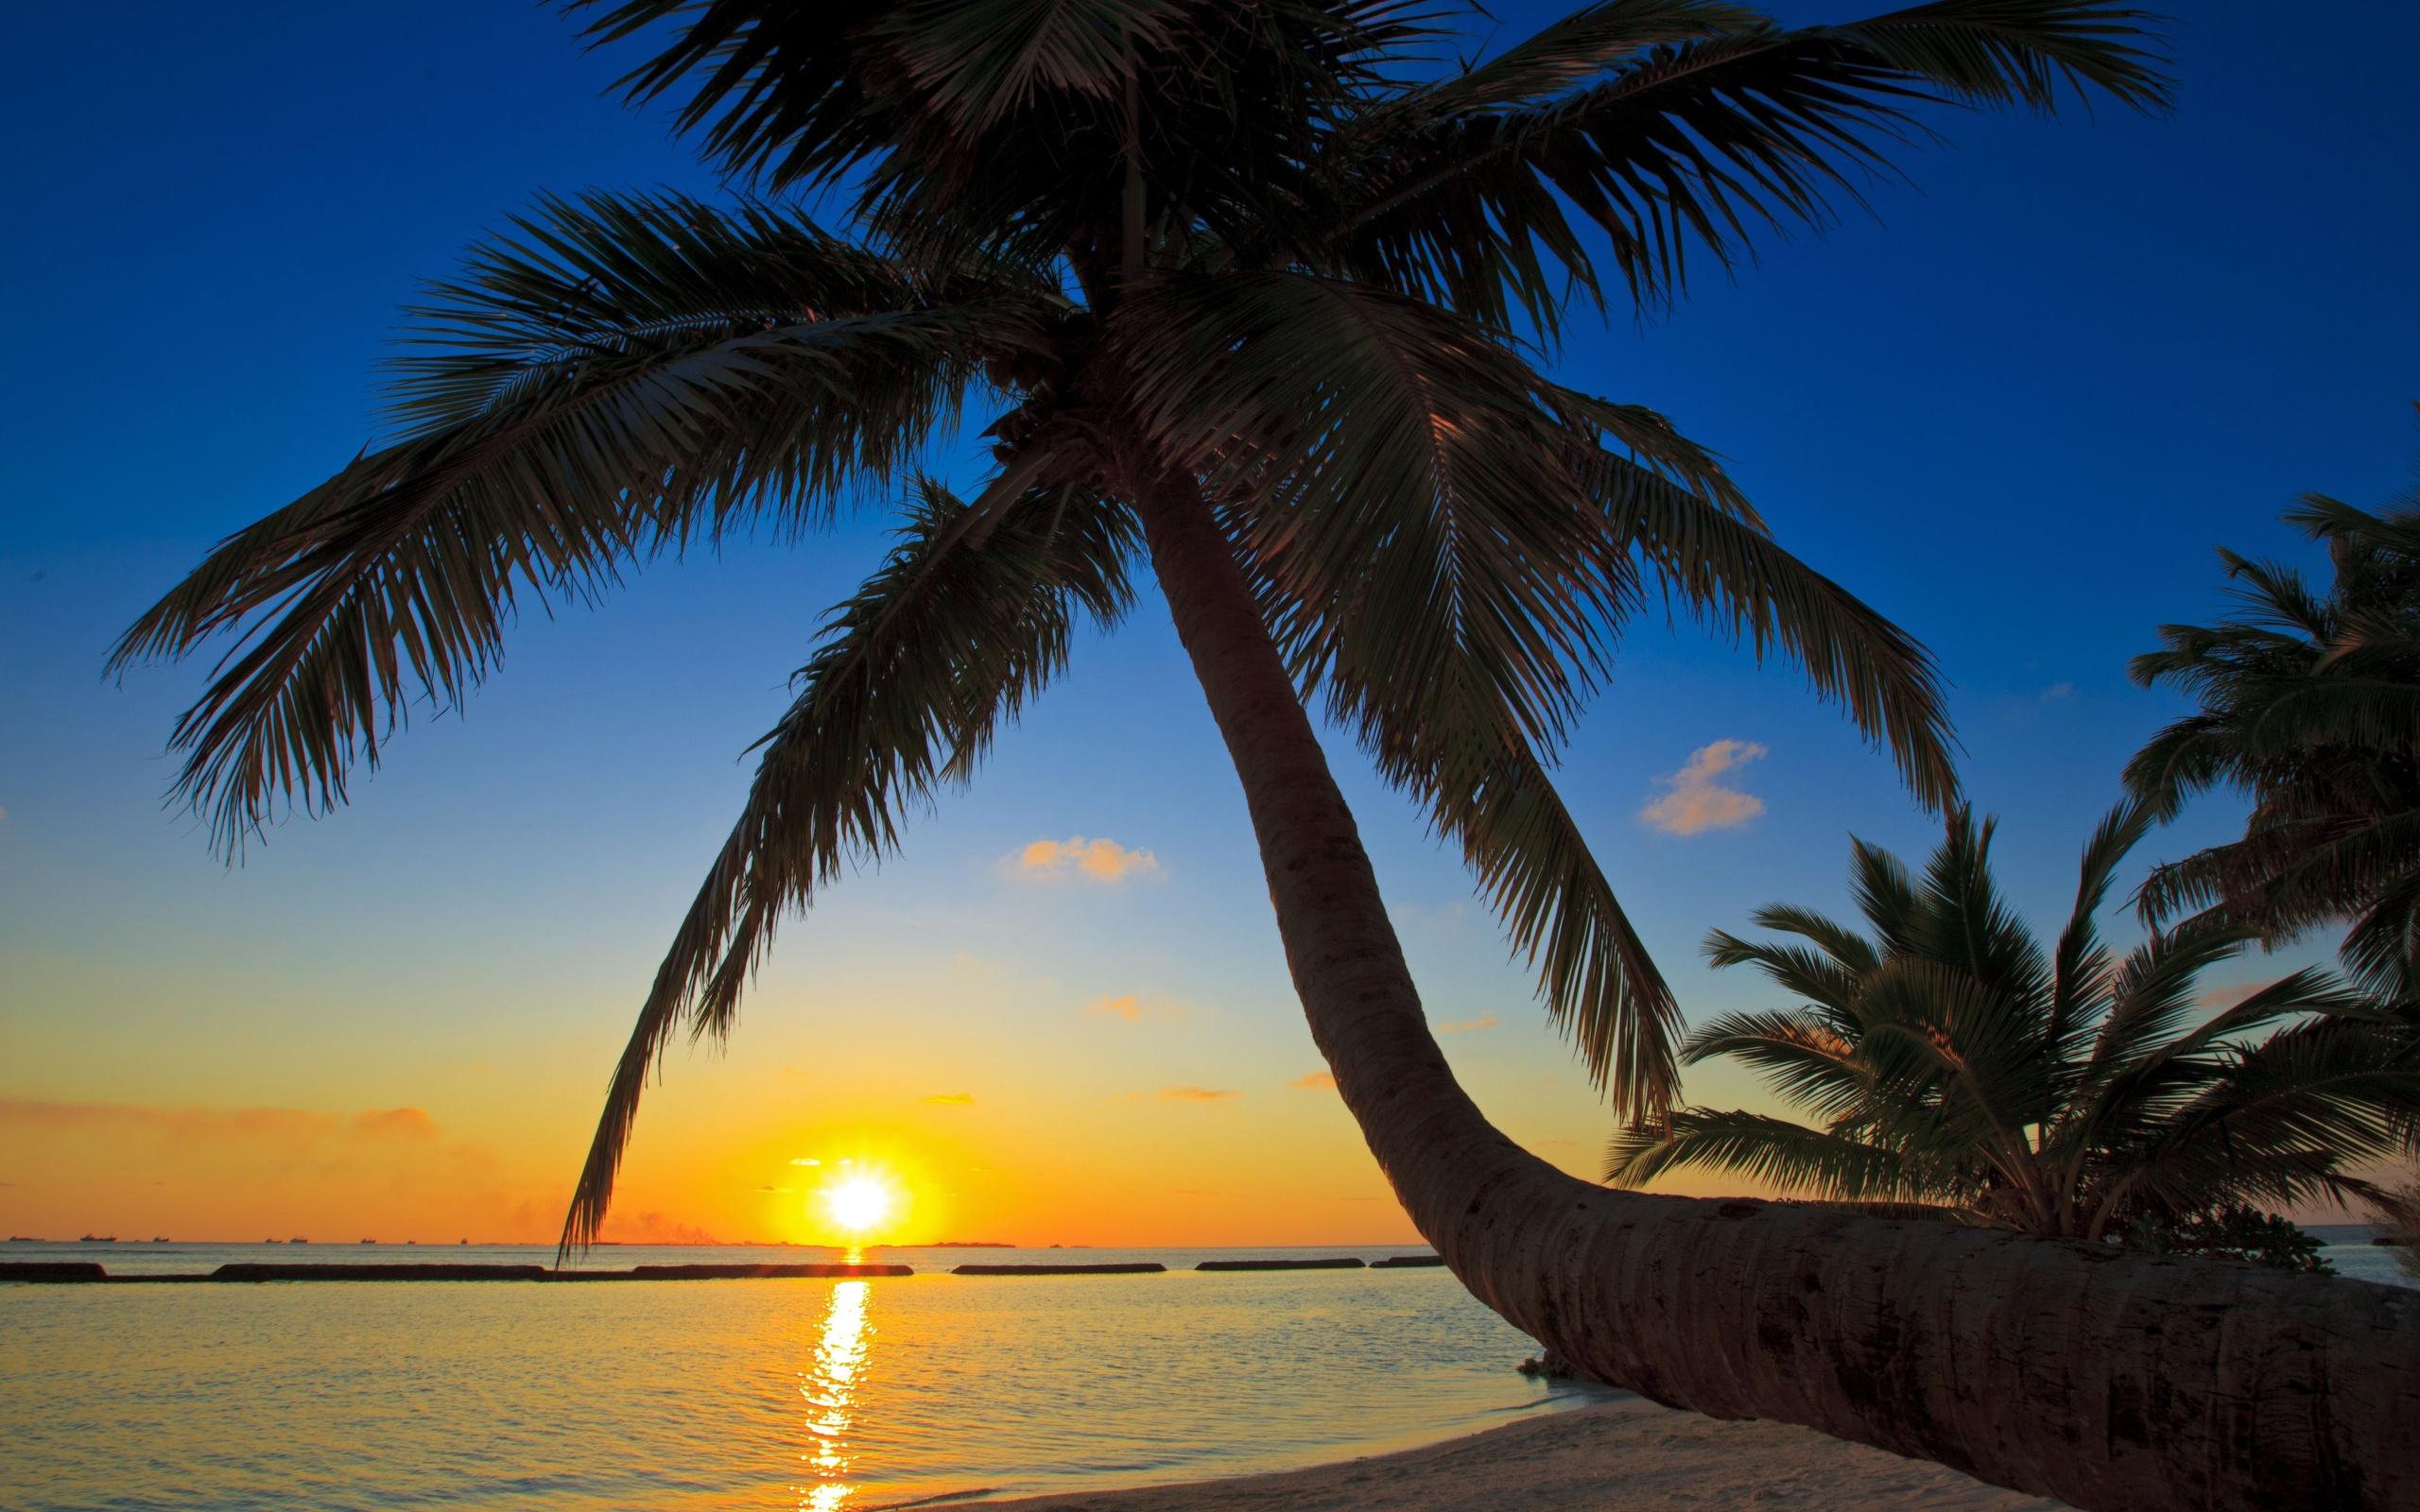 15 Wonderful HD Palm Tree Wallpapers - HDWallSource.com